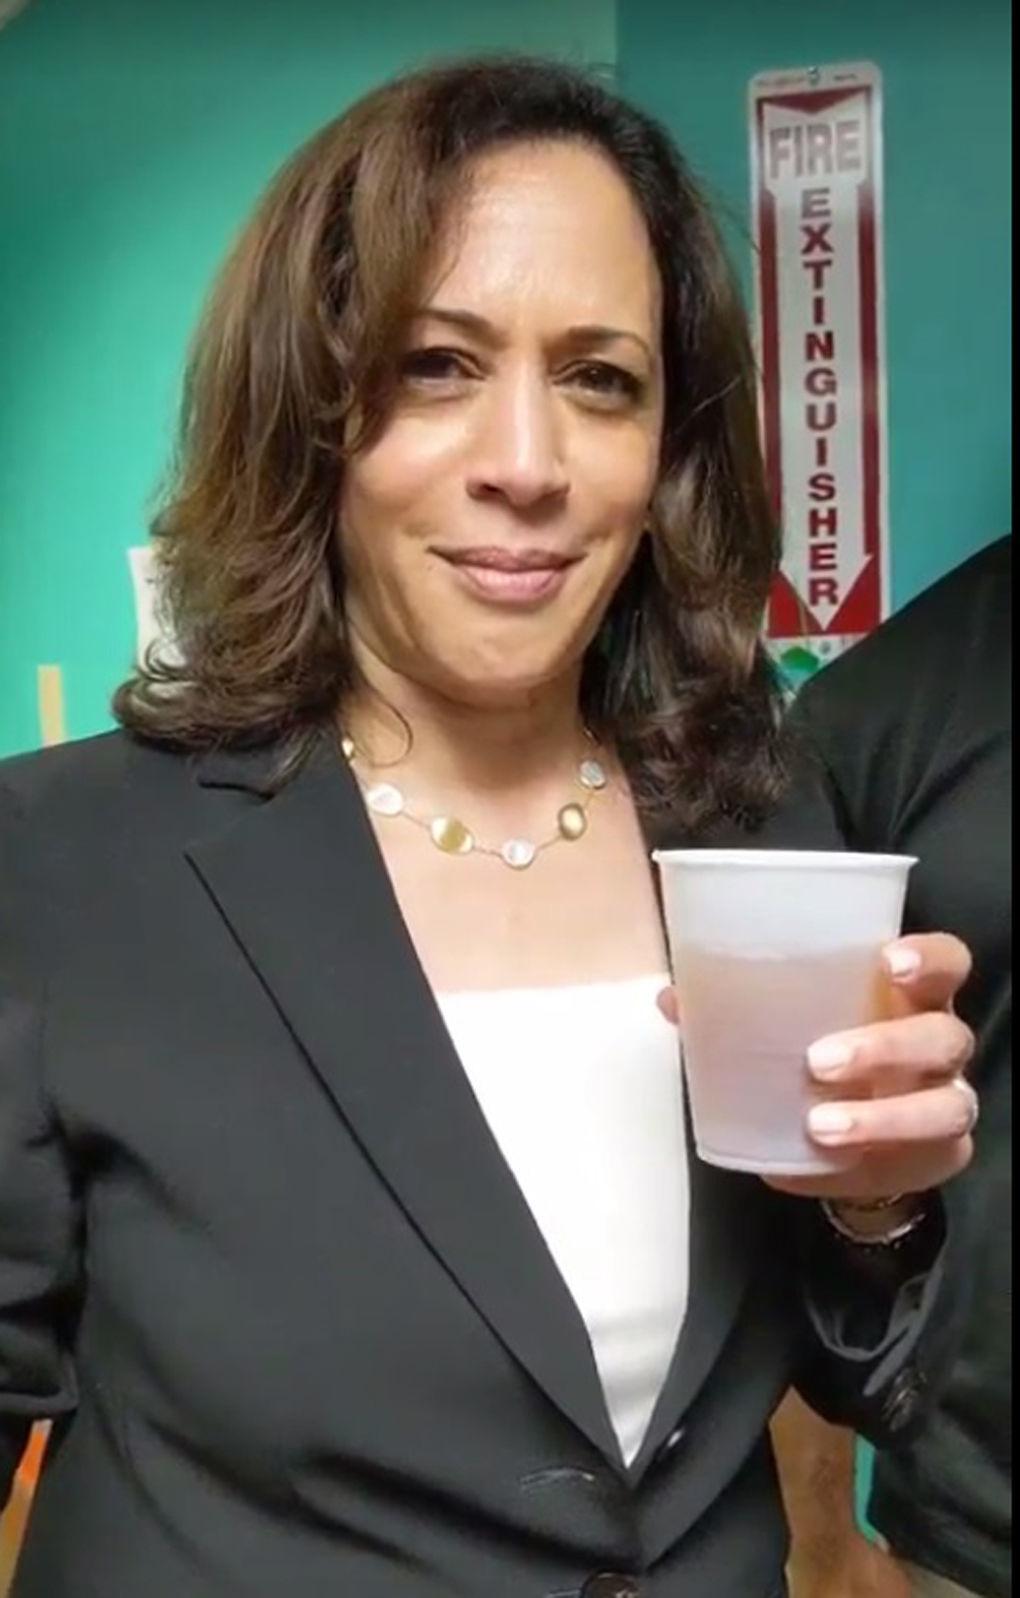 Harris tries the tea